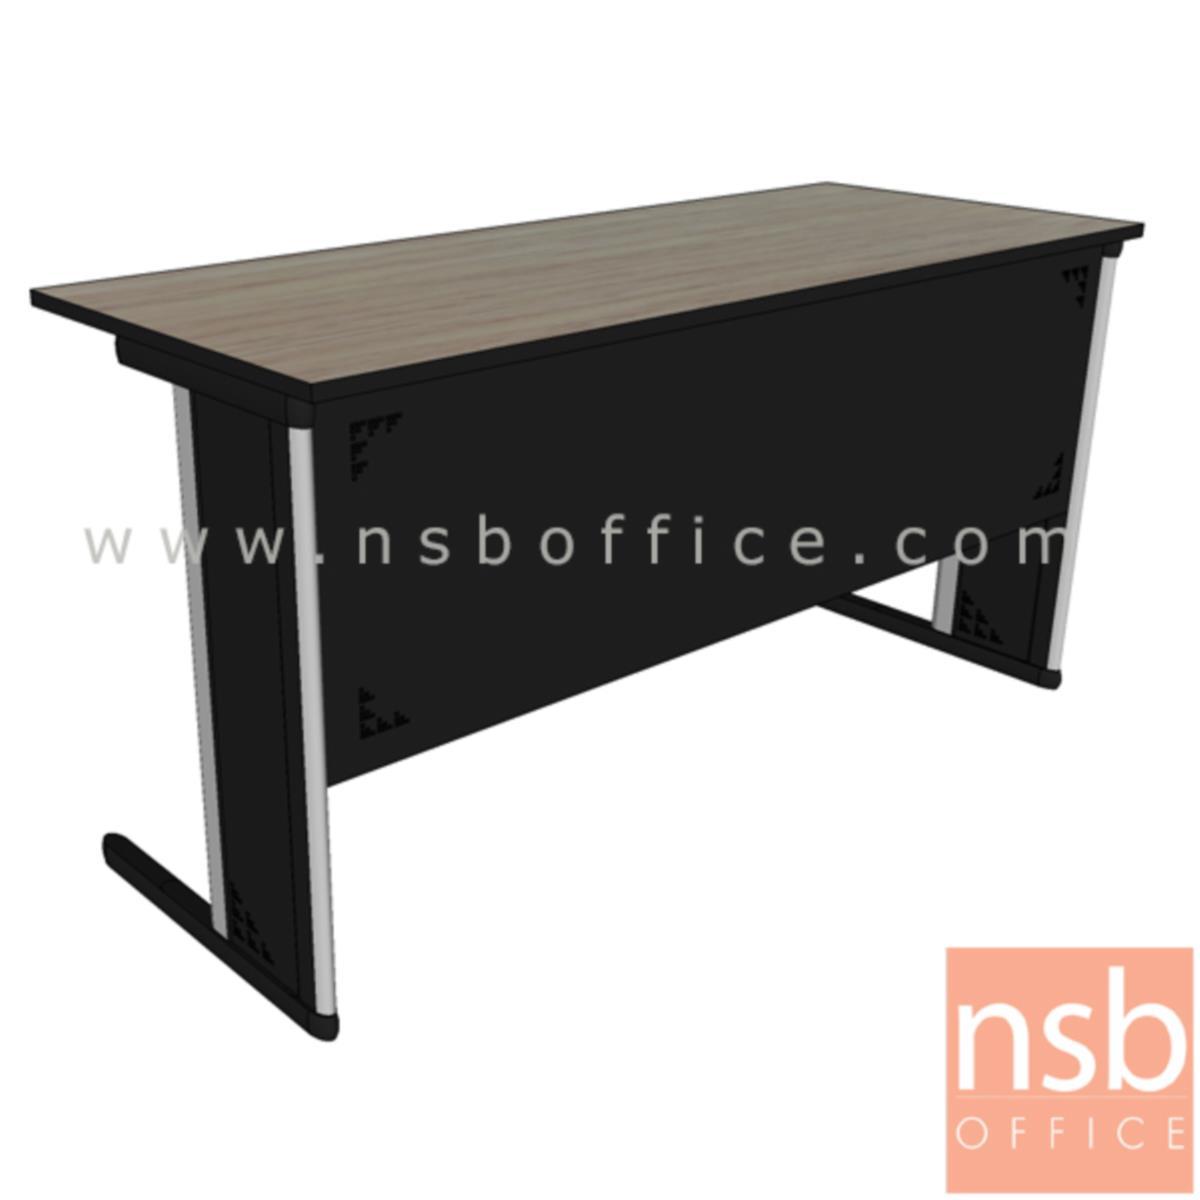 A18A081:โต๊ะประชุมตรง  ขนาด 80W ,120W ,150W ,180W ,210W cm. พร้อมบังตาเหล็กทำลวดลาย ขาเหล็กตัวแอล